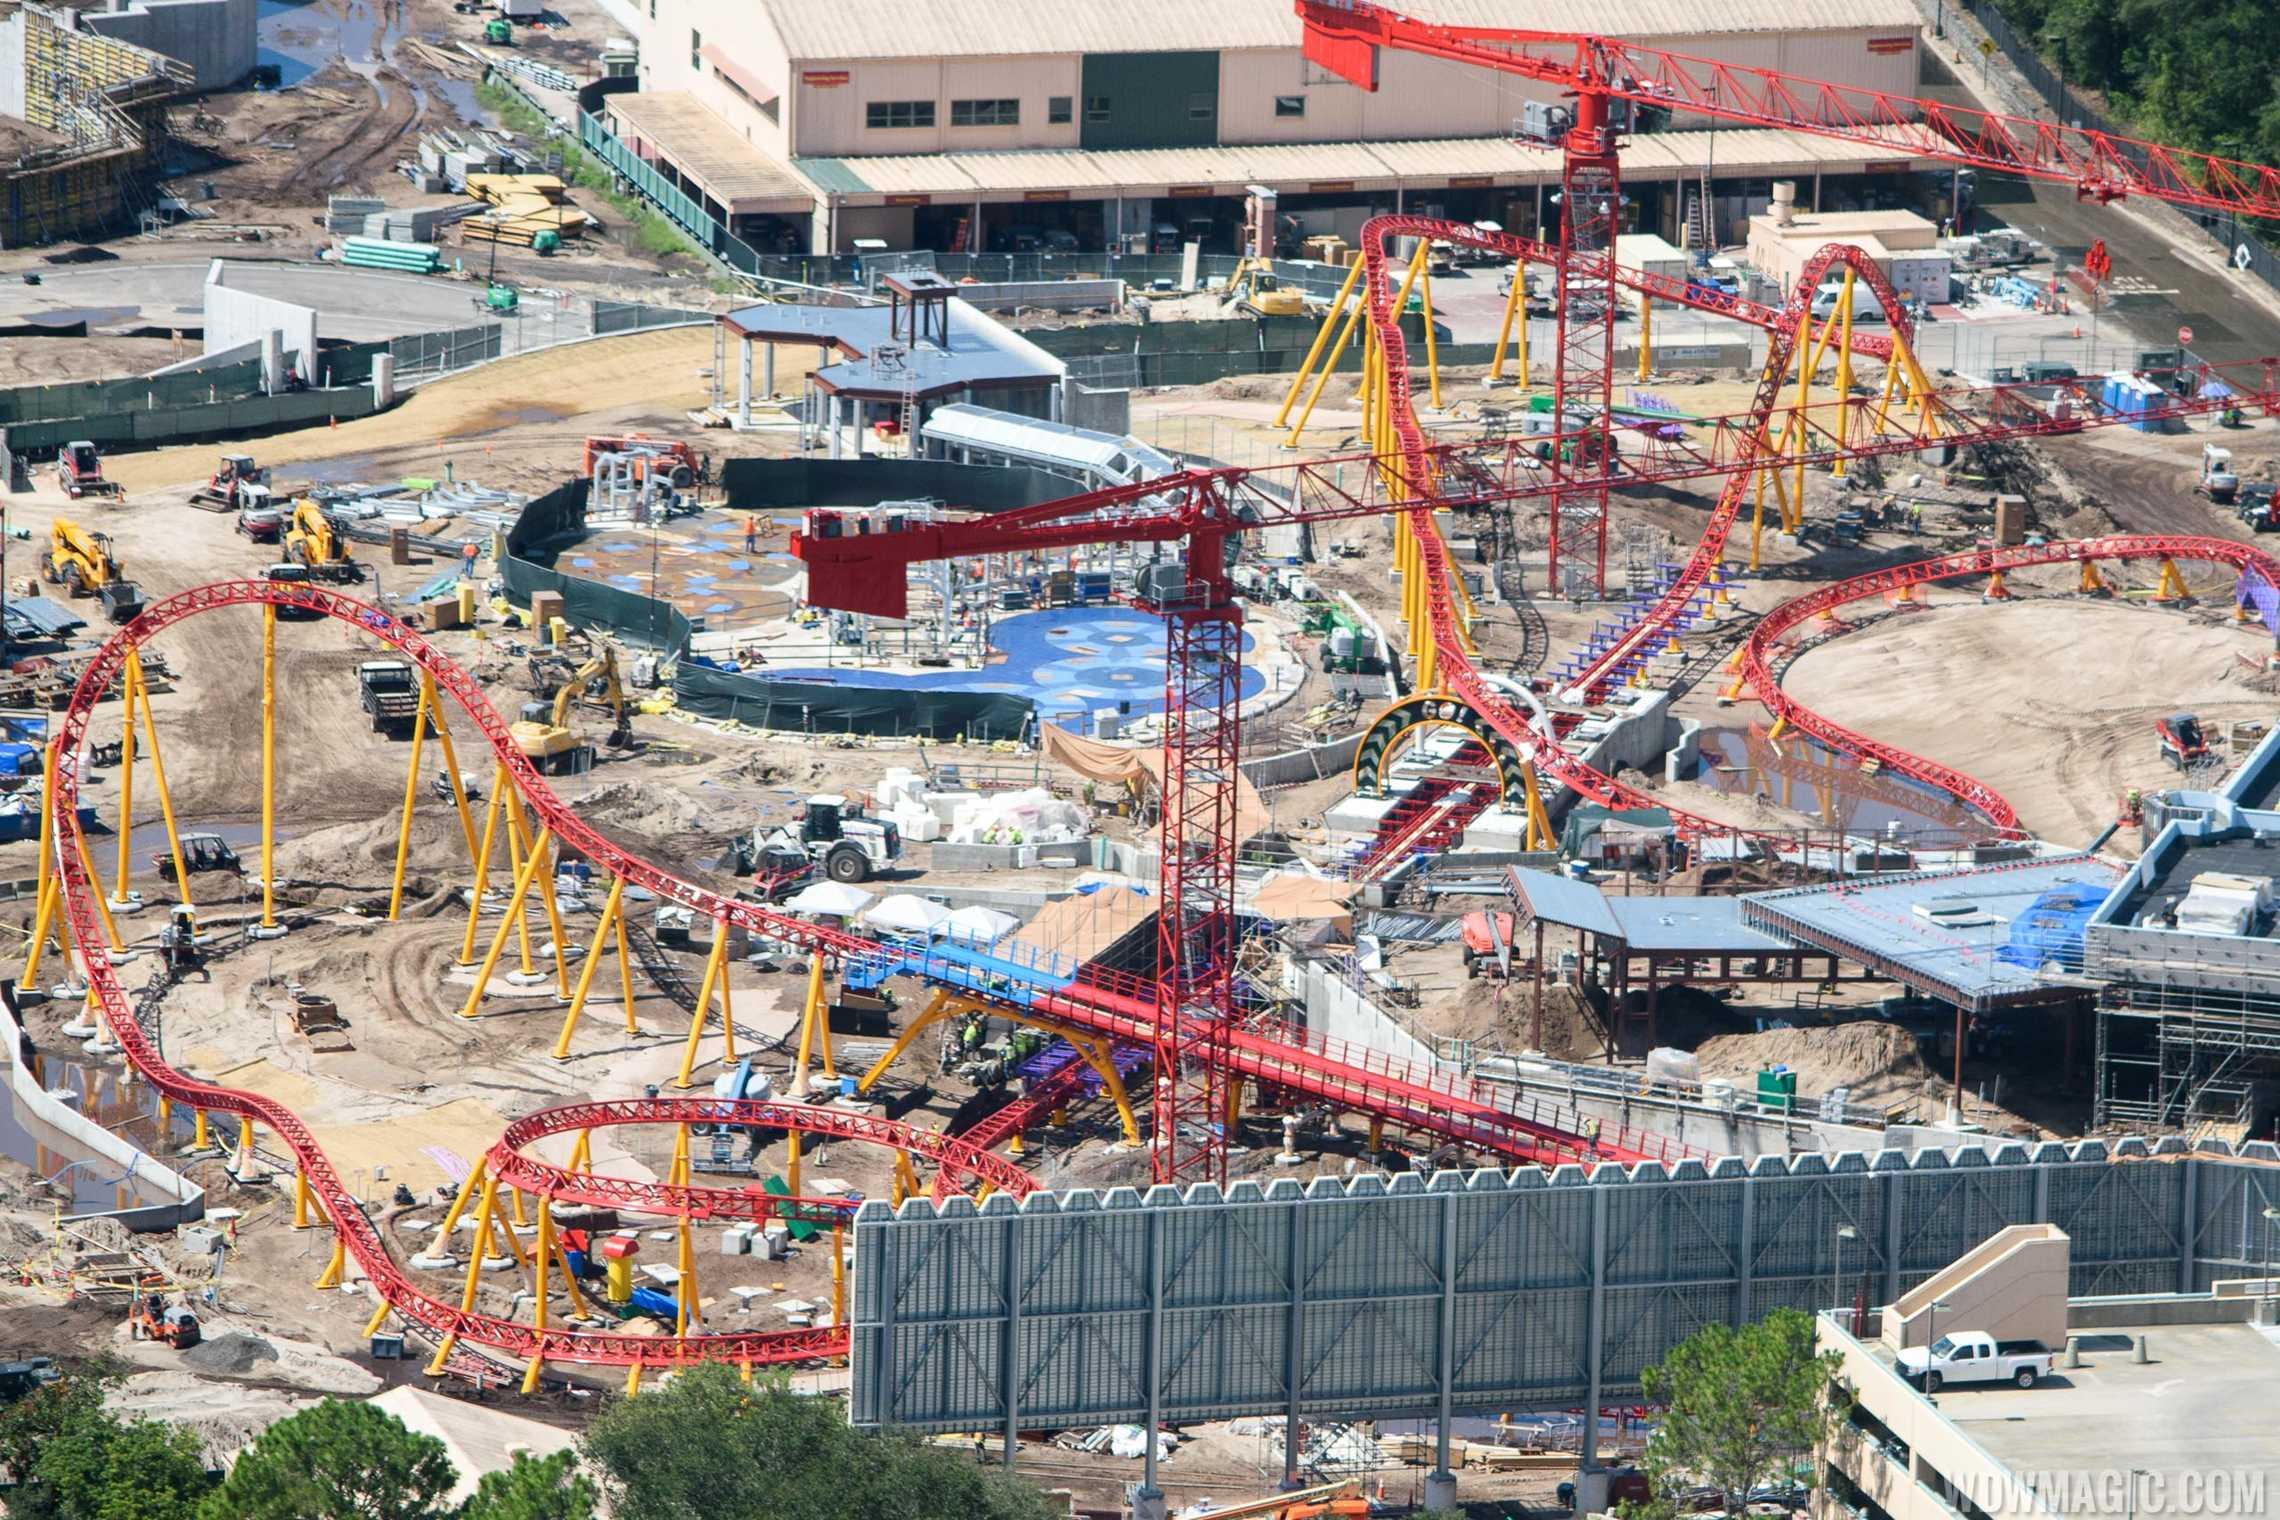 Slinky Dog Coaster construction at Toy Story Land